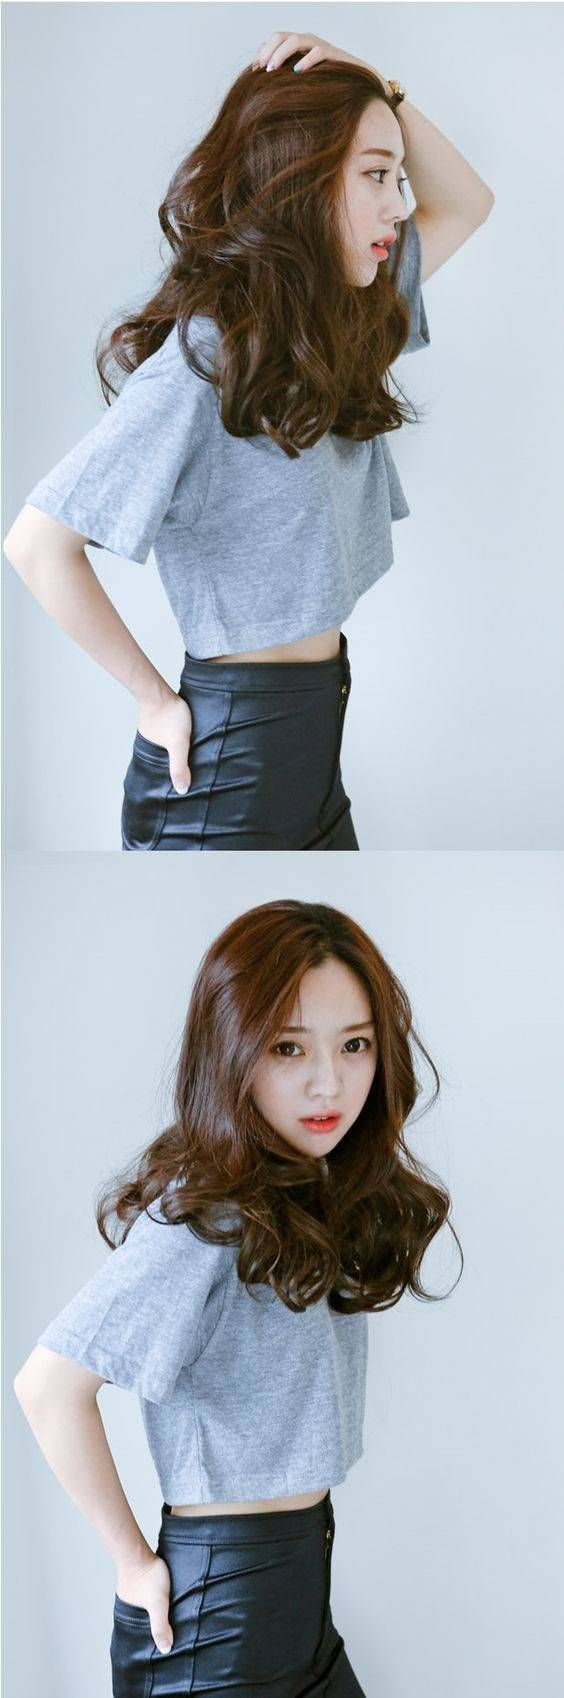 korean hair style 11 women  Medium hair styles, Hair styles